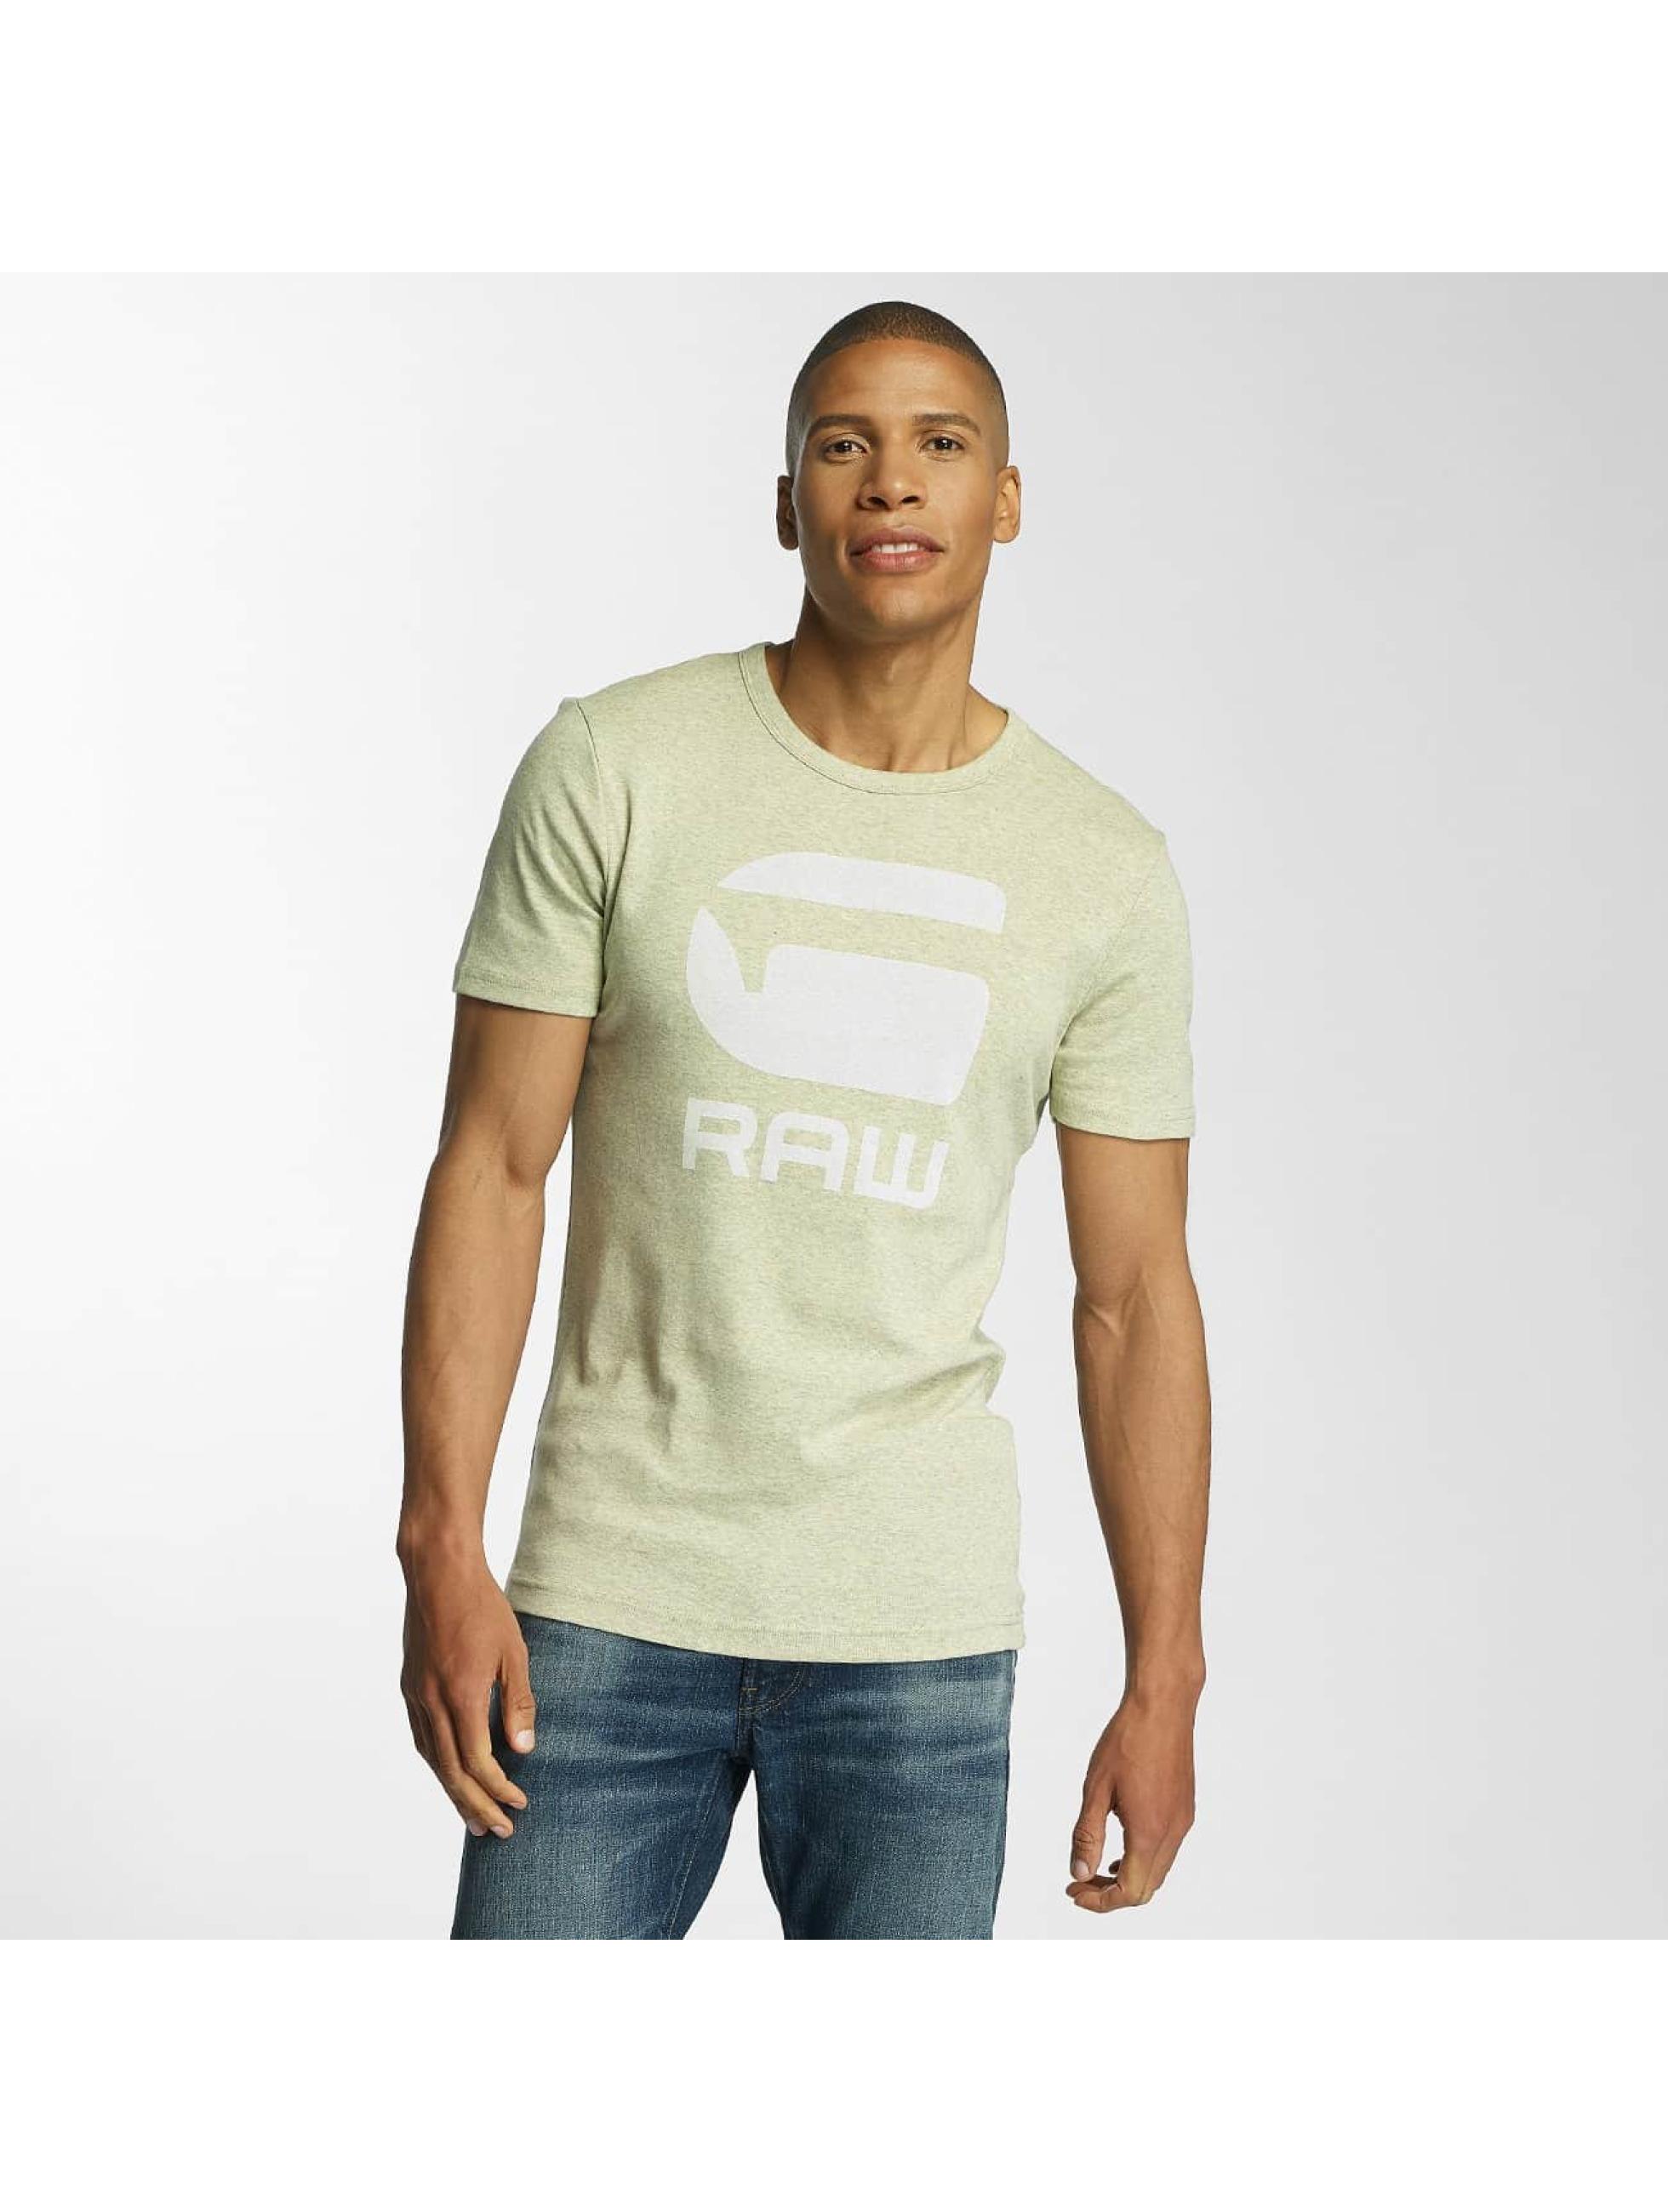 G-Star Männer T-Shirt Drillon Cool Rib in gelb